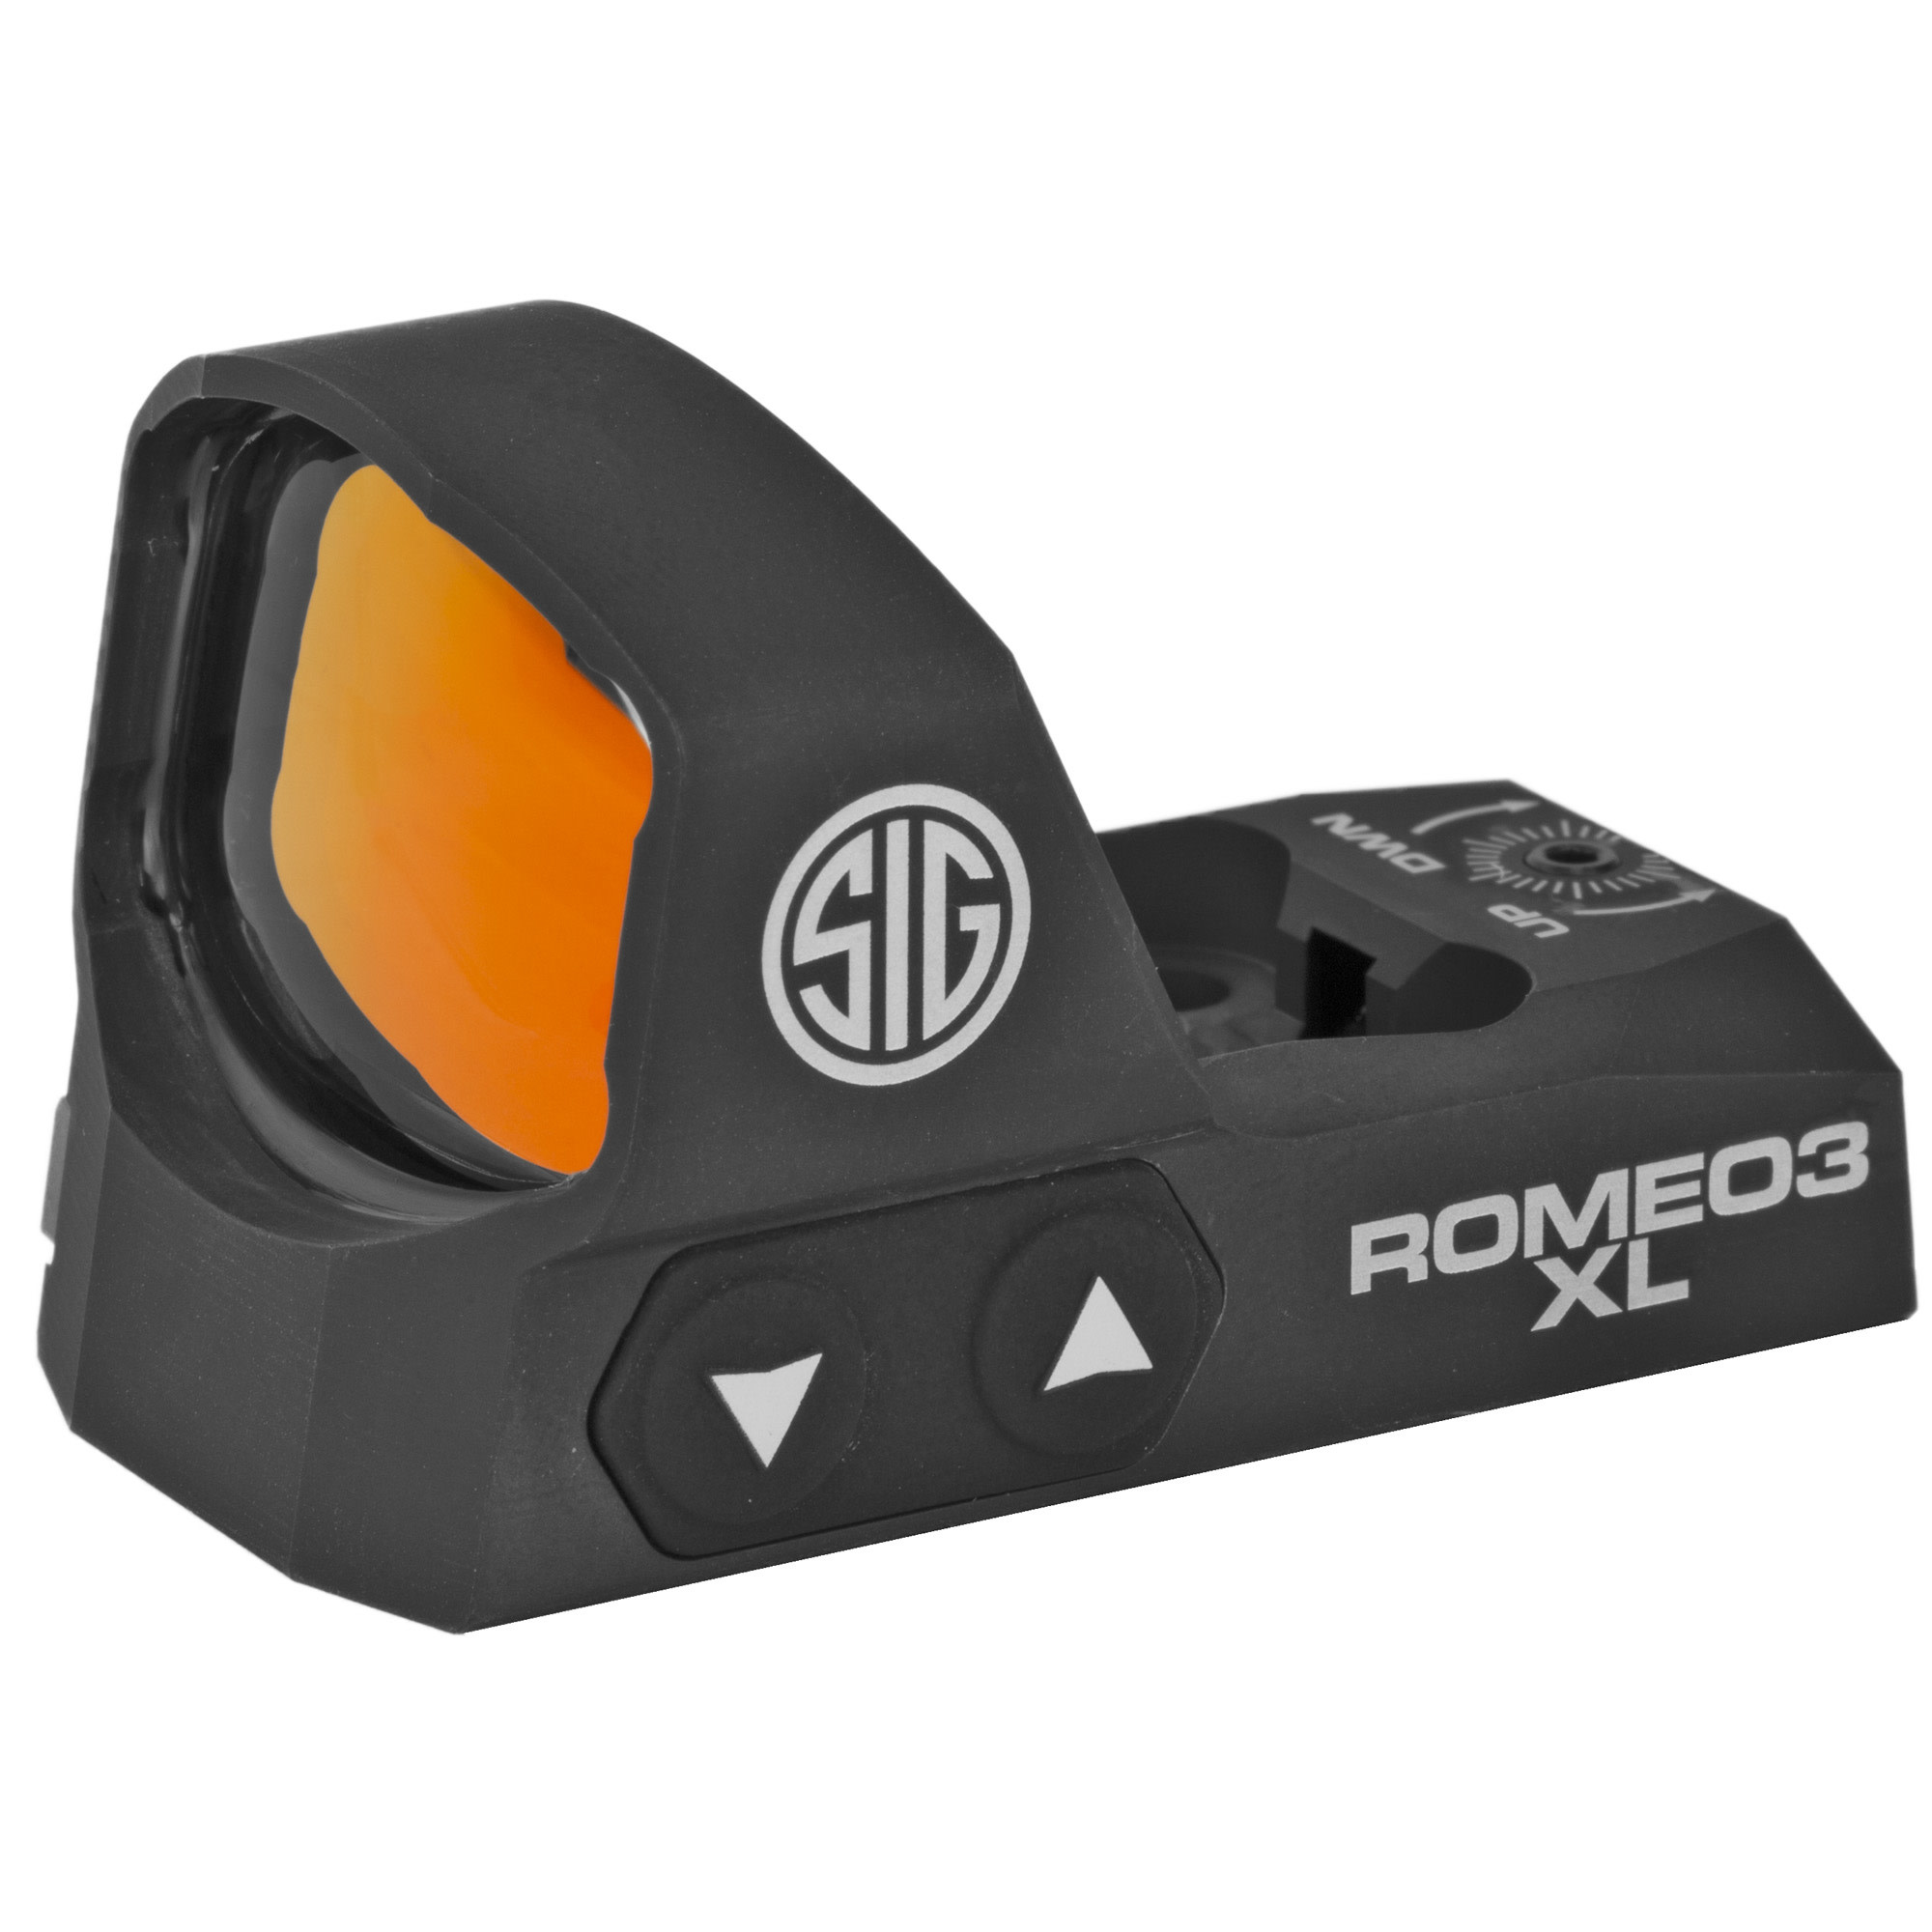 Sig Sauer, Romeo 3 XL, Reflex Sight, 3 MOA Dot, Black Finish, 1 MOA Adjustments